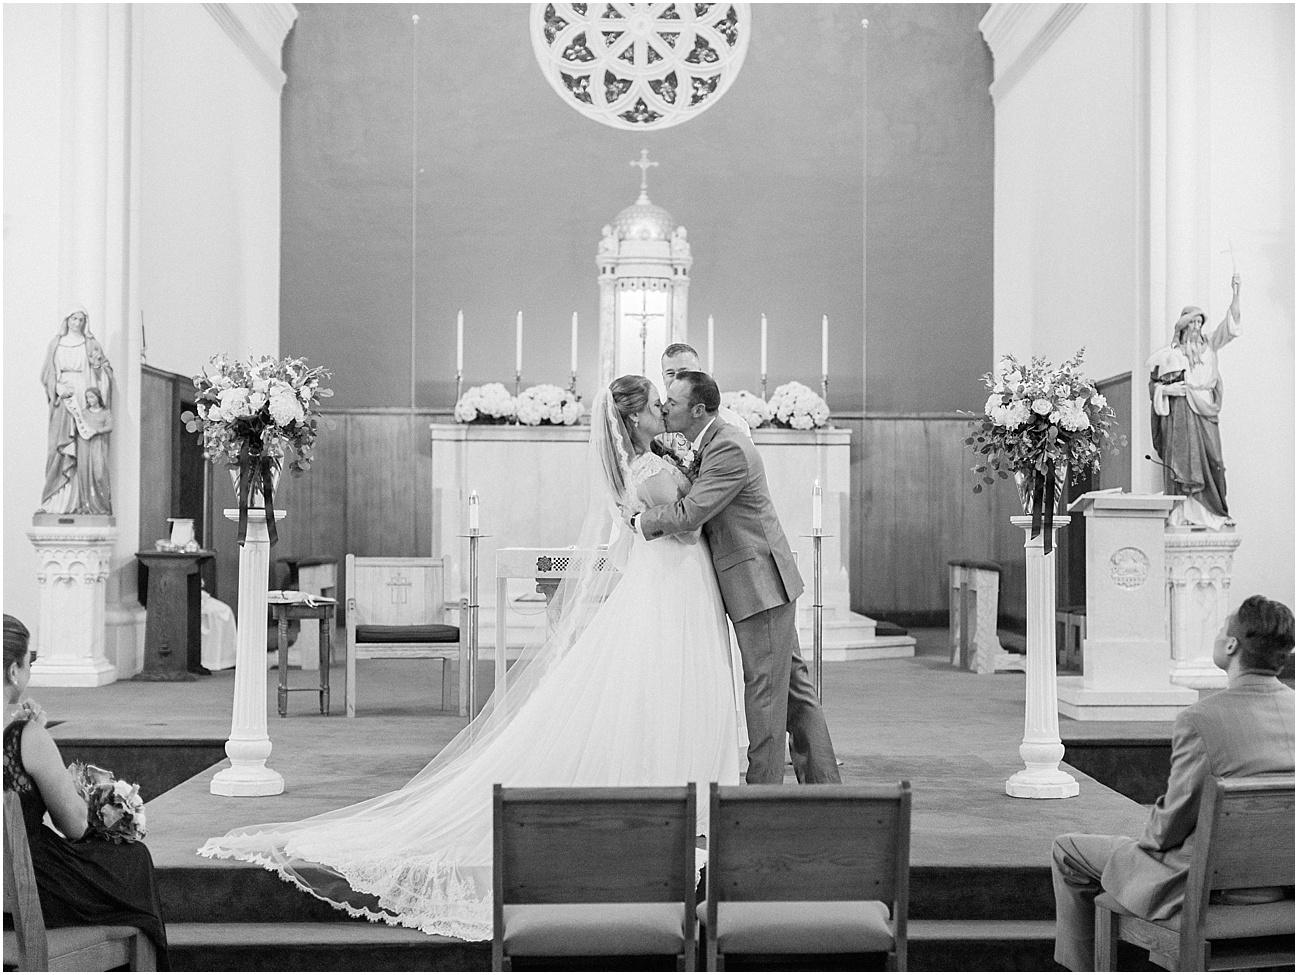 jaclyn_adam_st_ann_brendans_dorchester_southie_castle_bride_groom_venezia_waterfront__cape_cod_boston_wedding_photographer_meredith_jane_photography_photo_0910.jpg